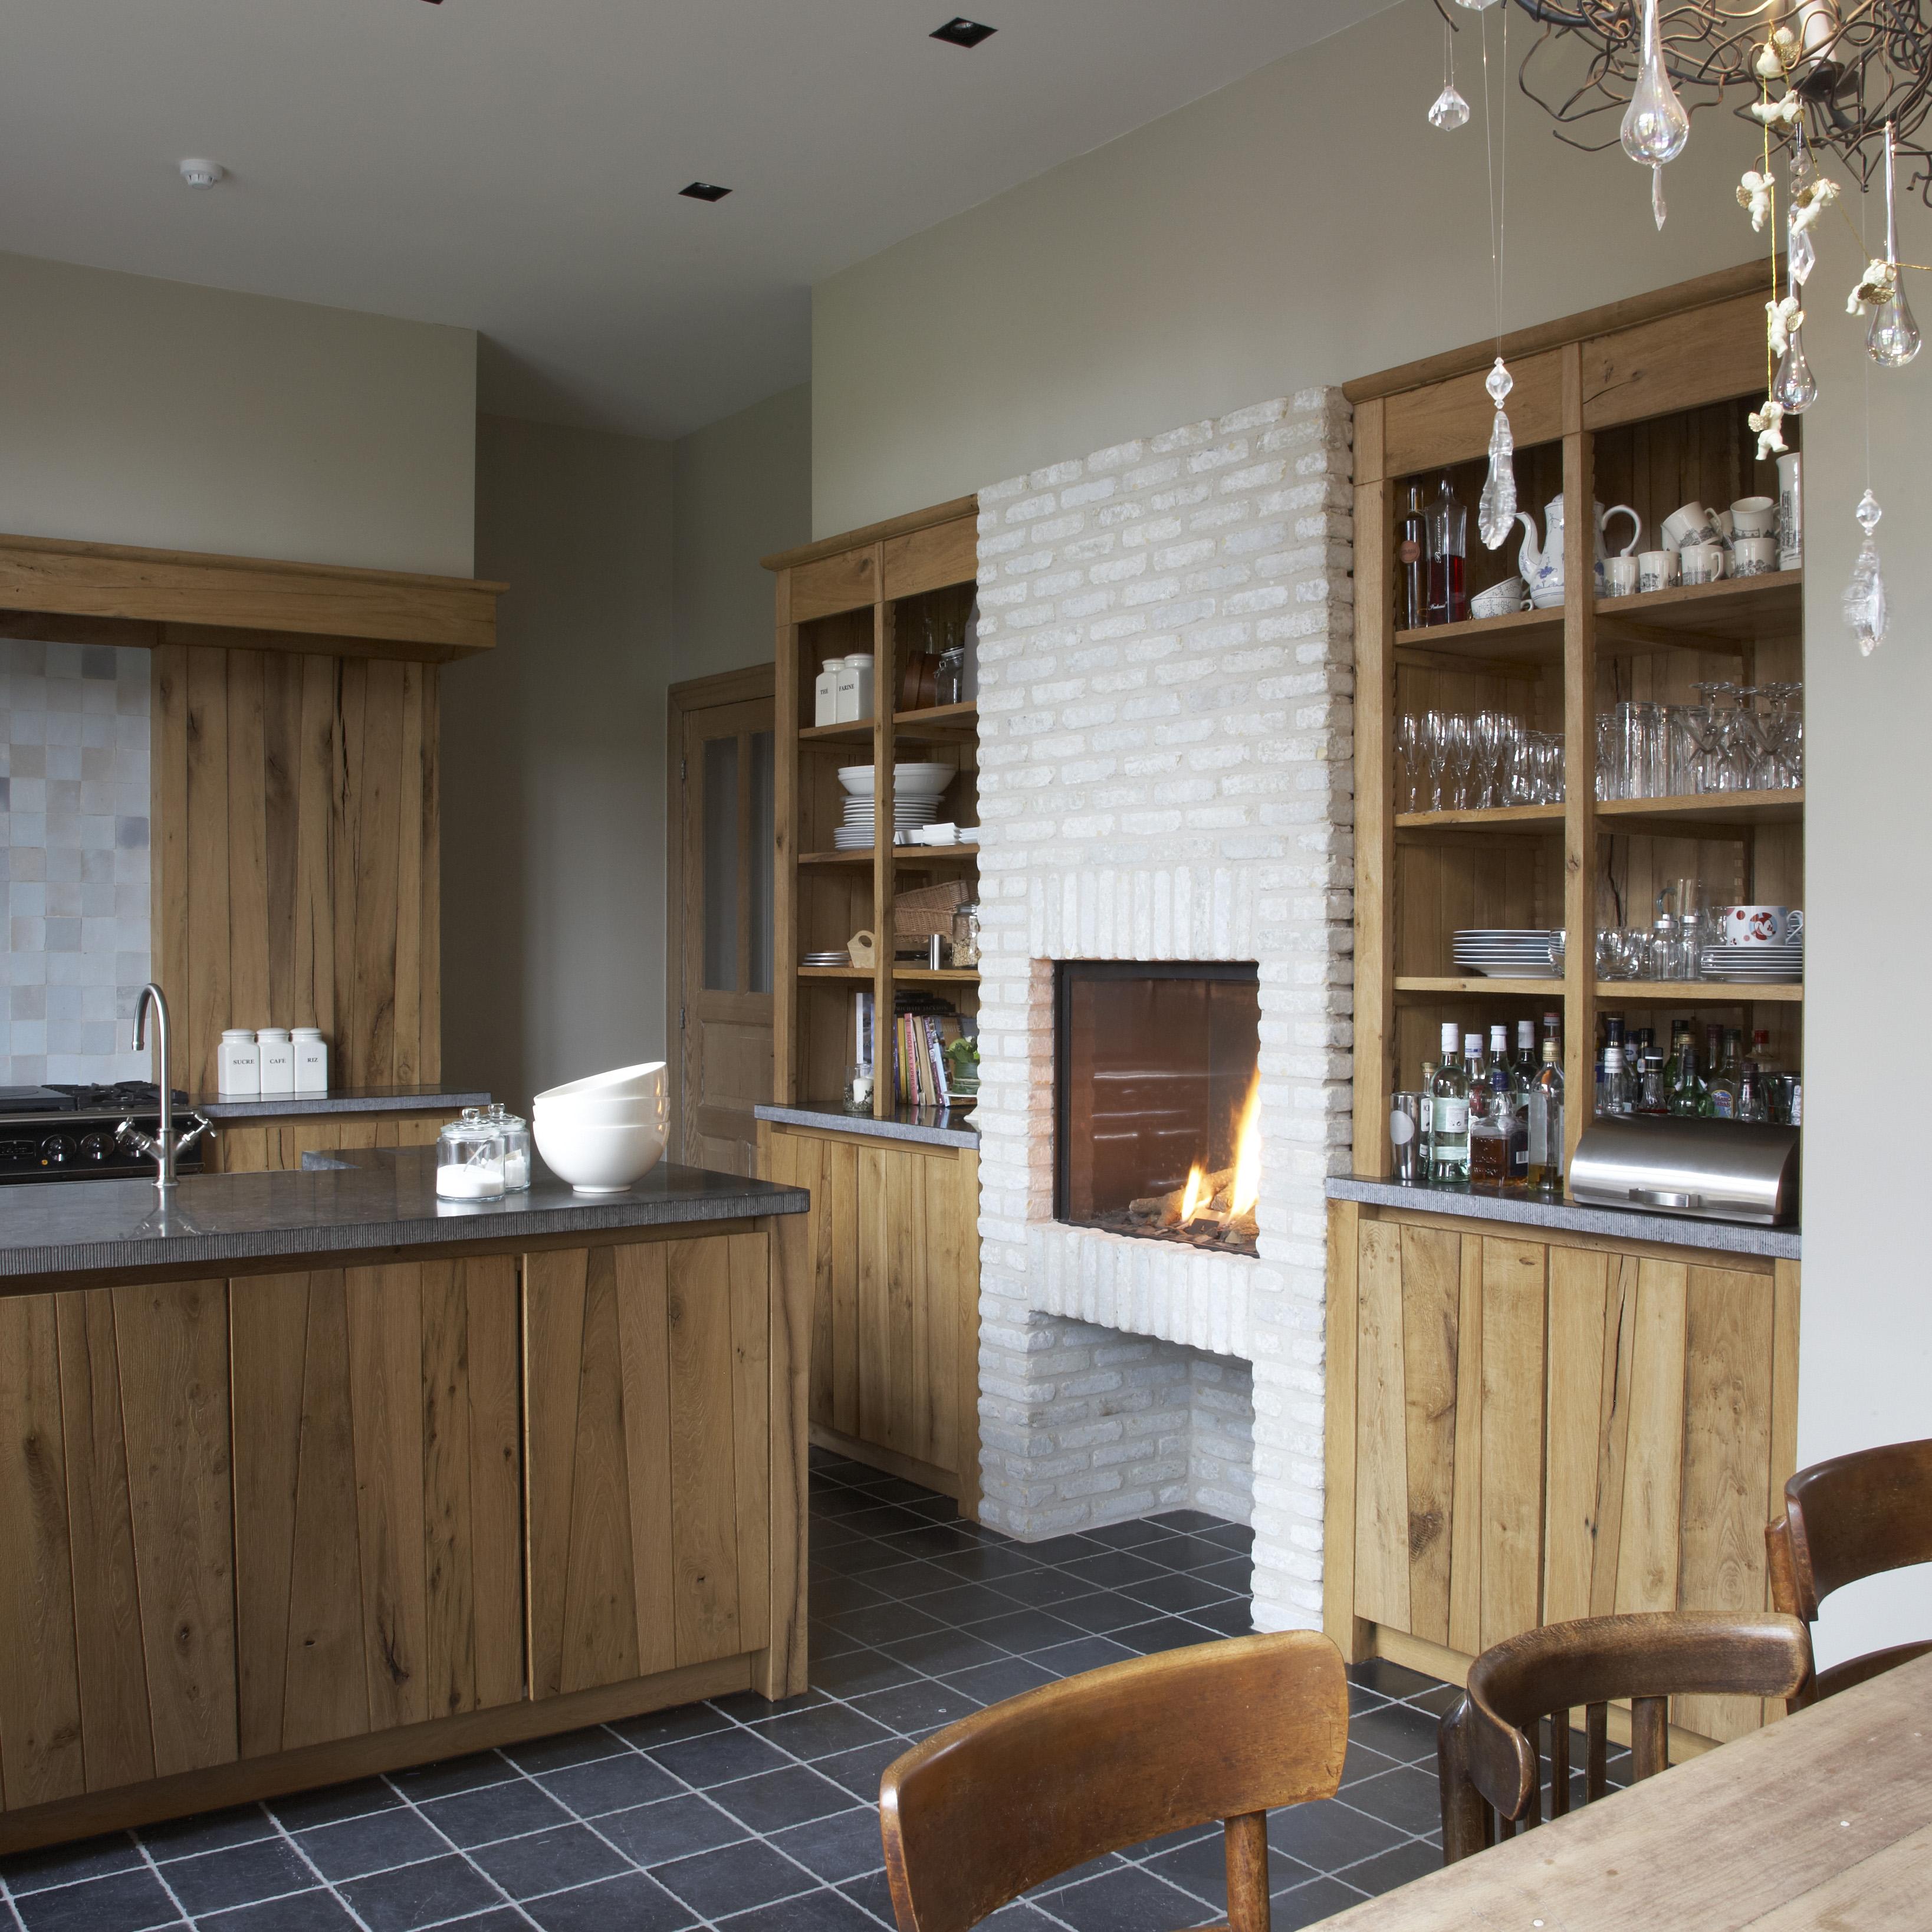 Keuken l interieur verkest - Oude stijl keuken wastafel ...